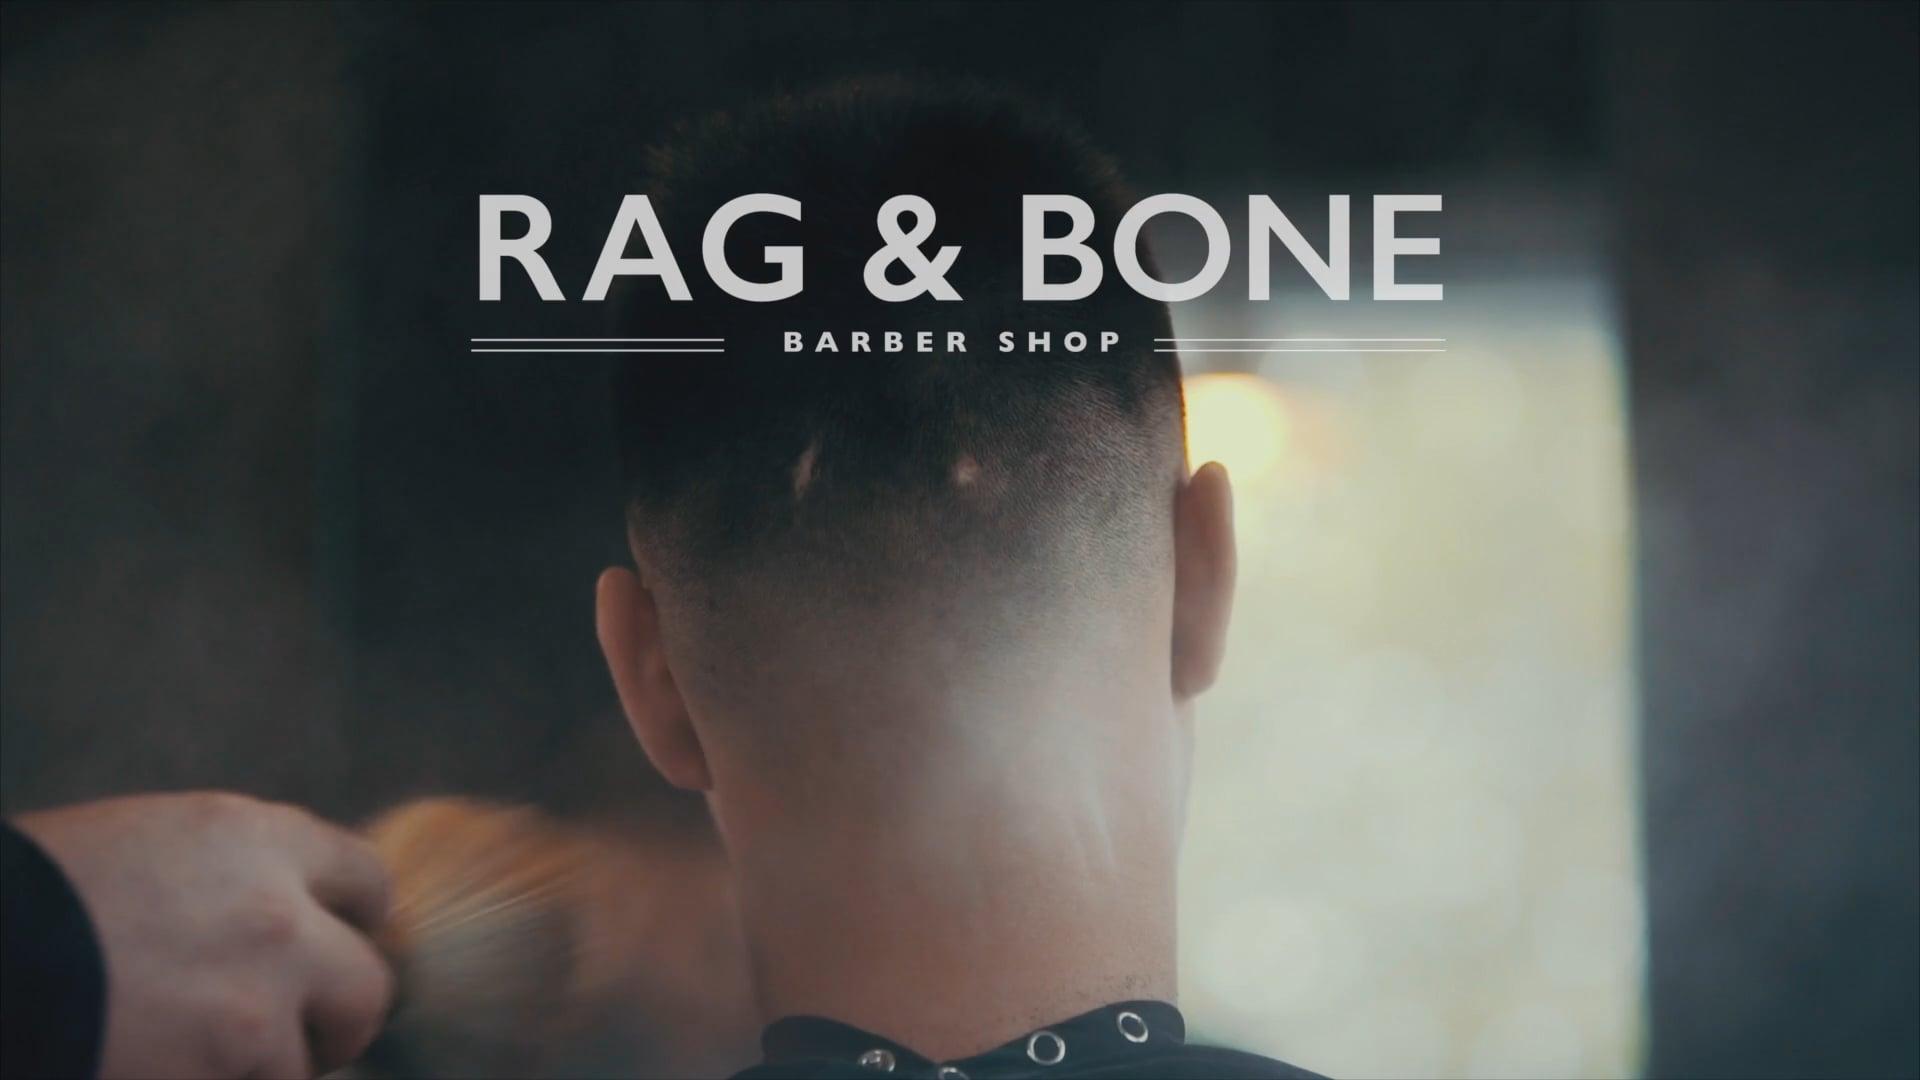 Rag & Bone Barber Shop